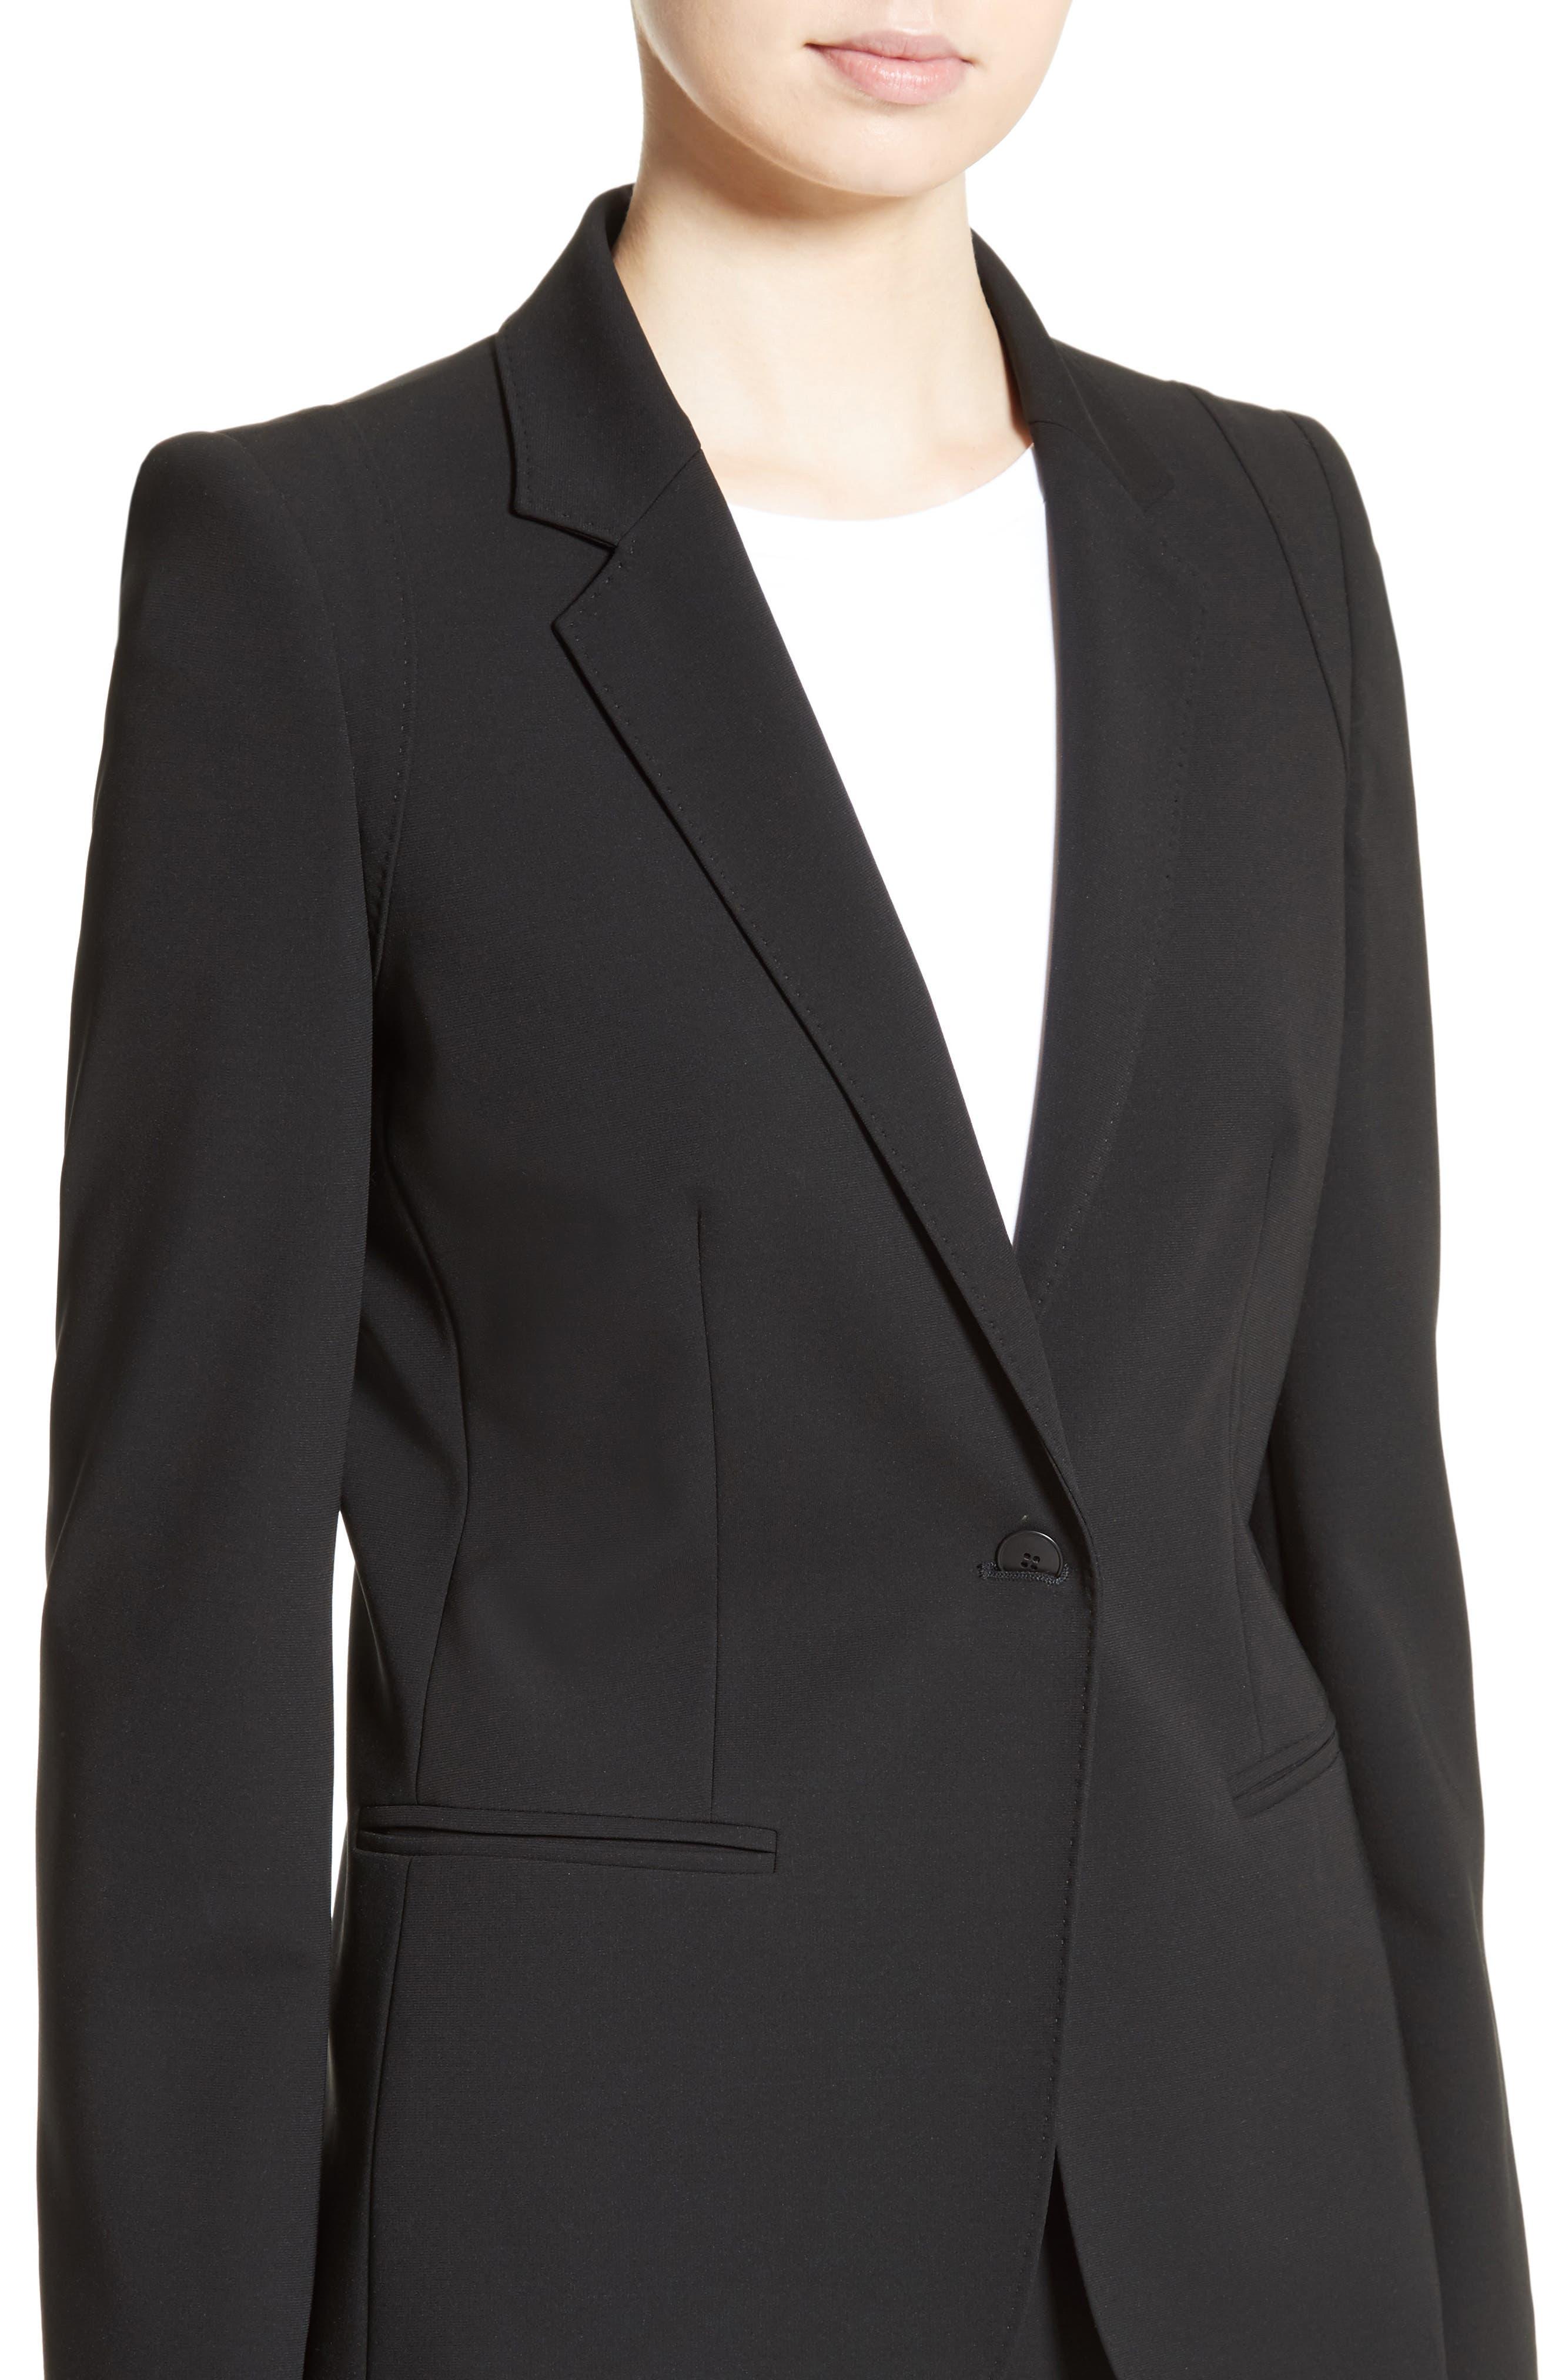 Bari Stretch Jersey Jacket,                             Alternate thumbnail 6, color,                             Black